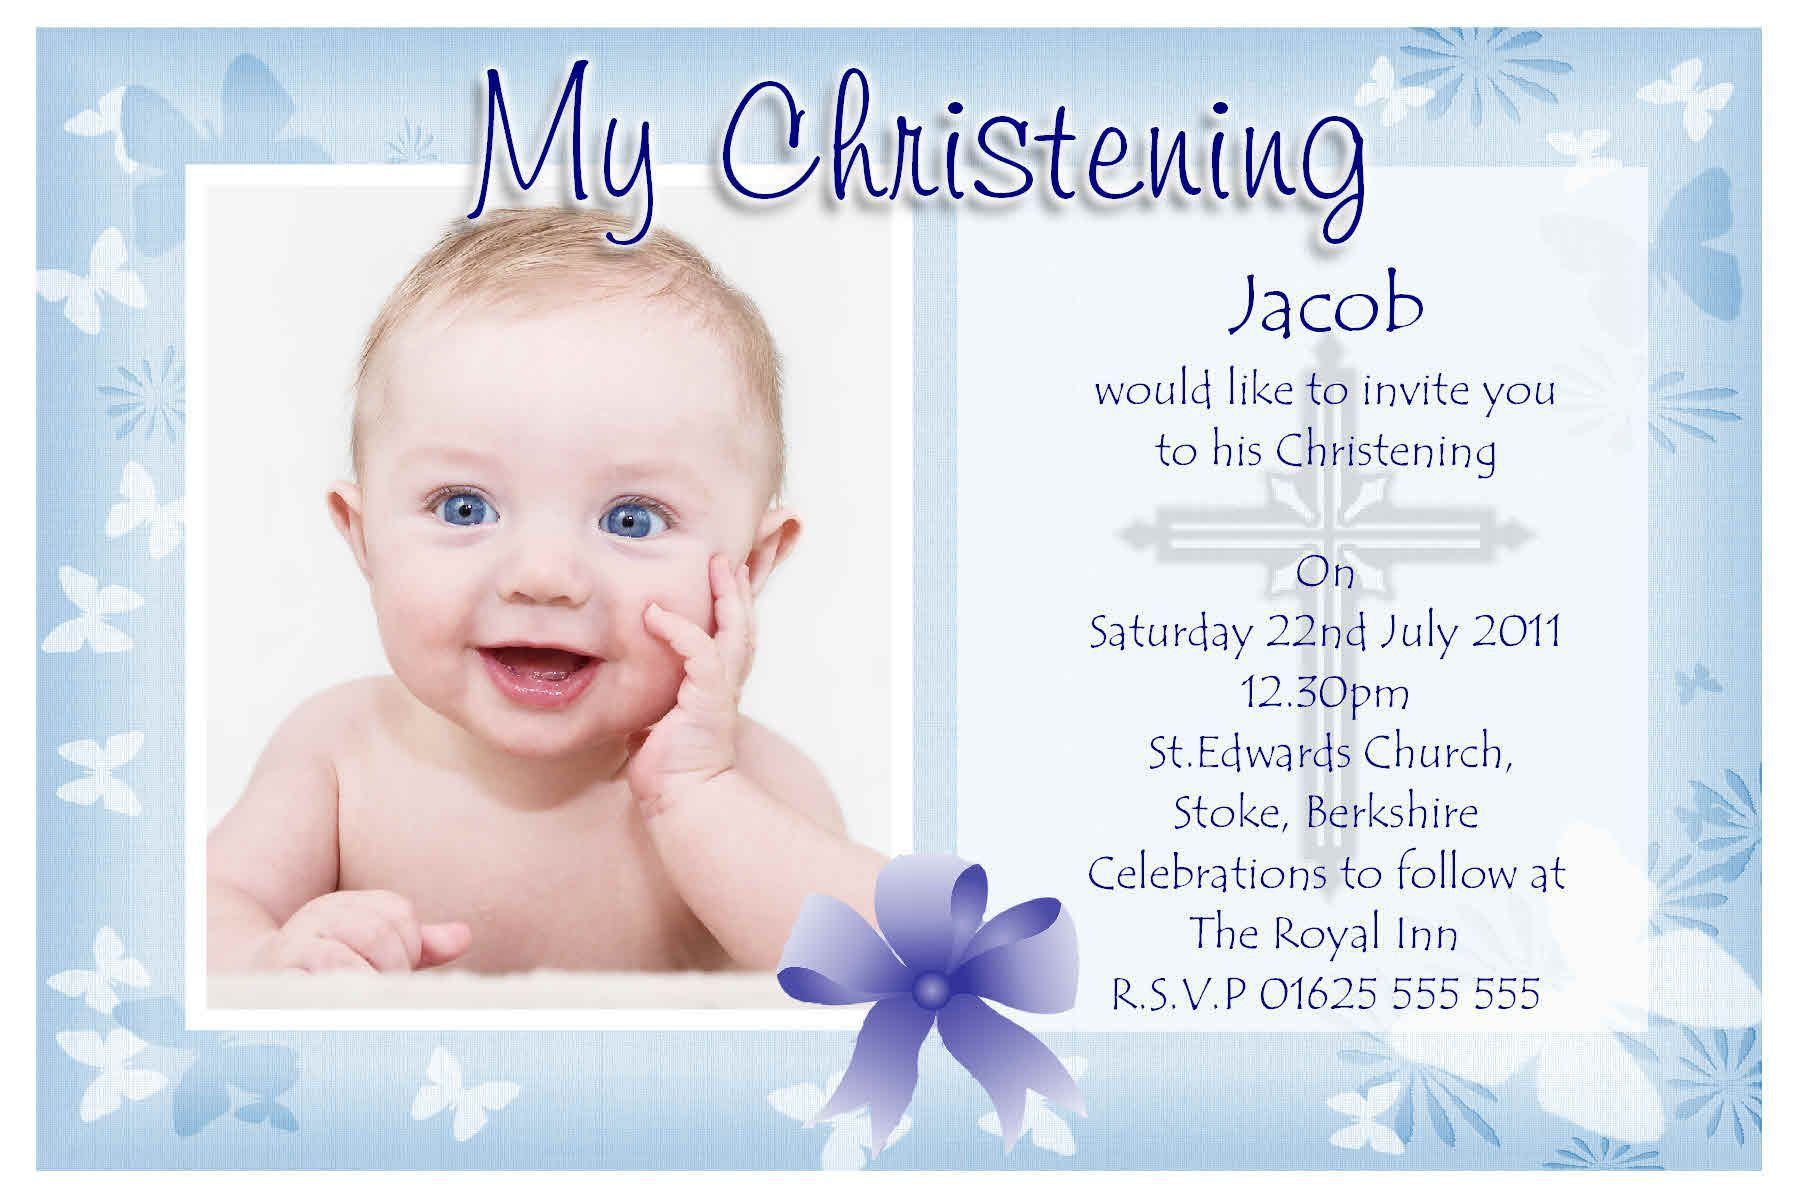 Invitation Card For Christening Blank